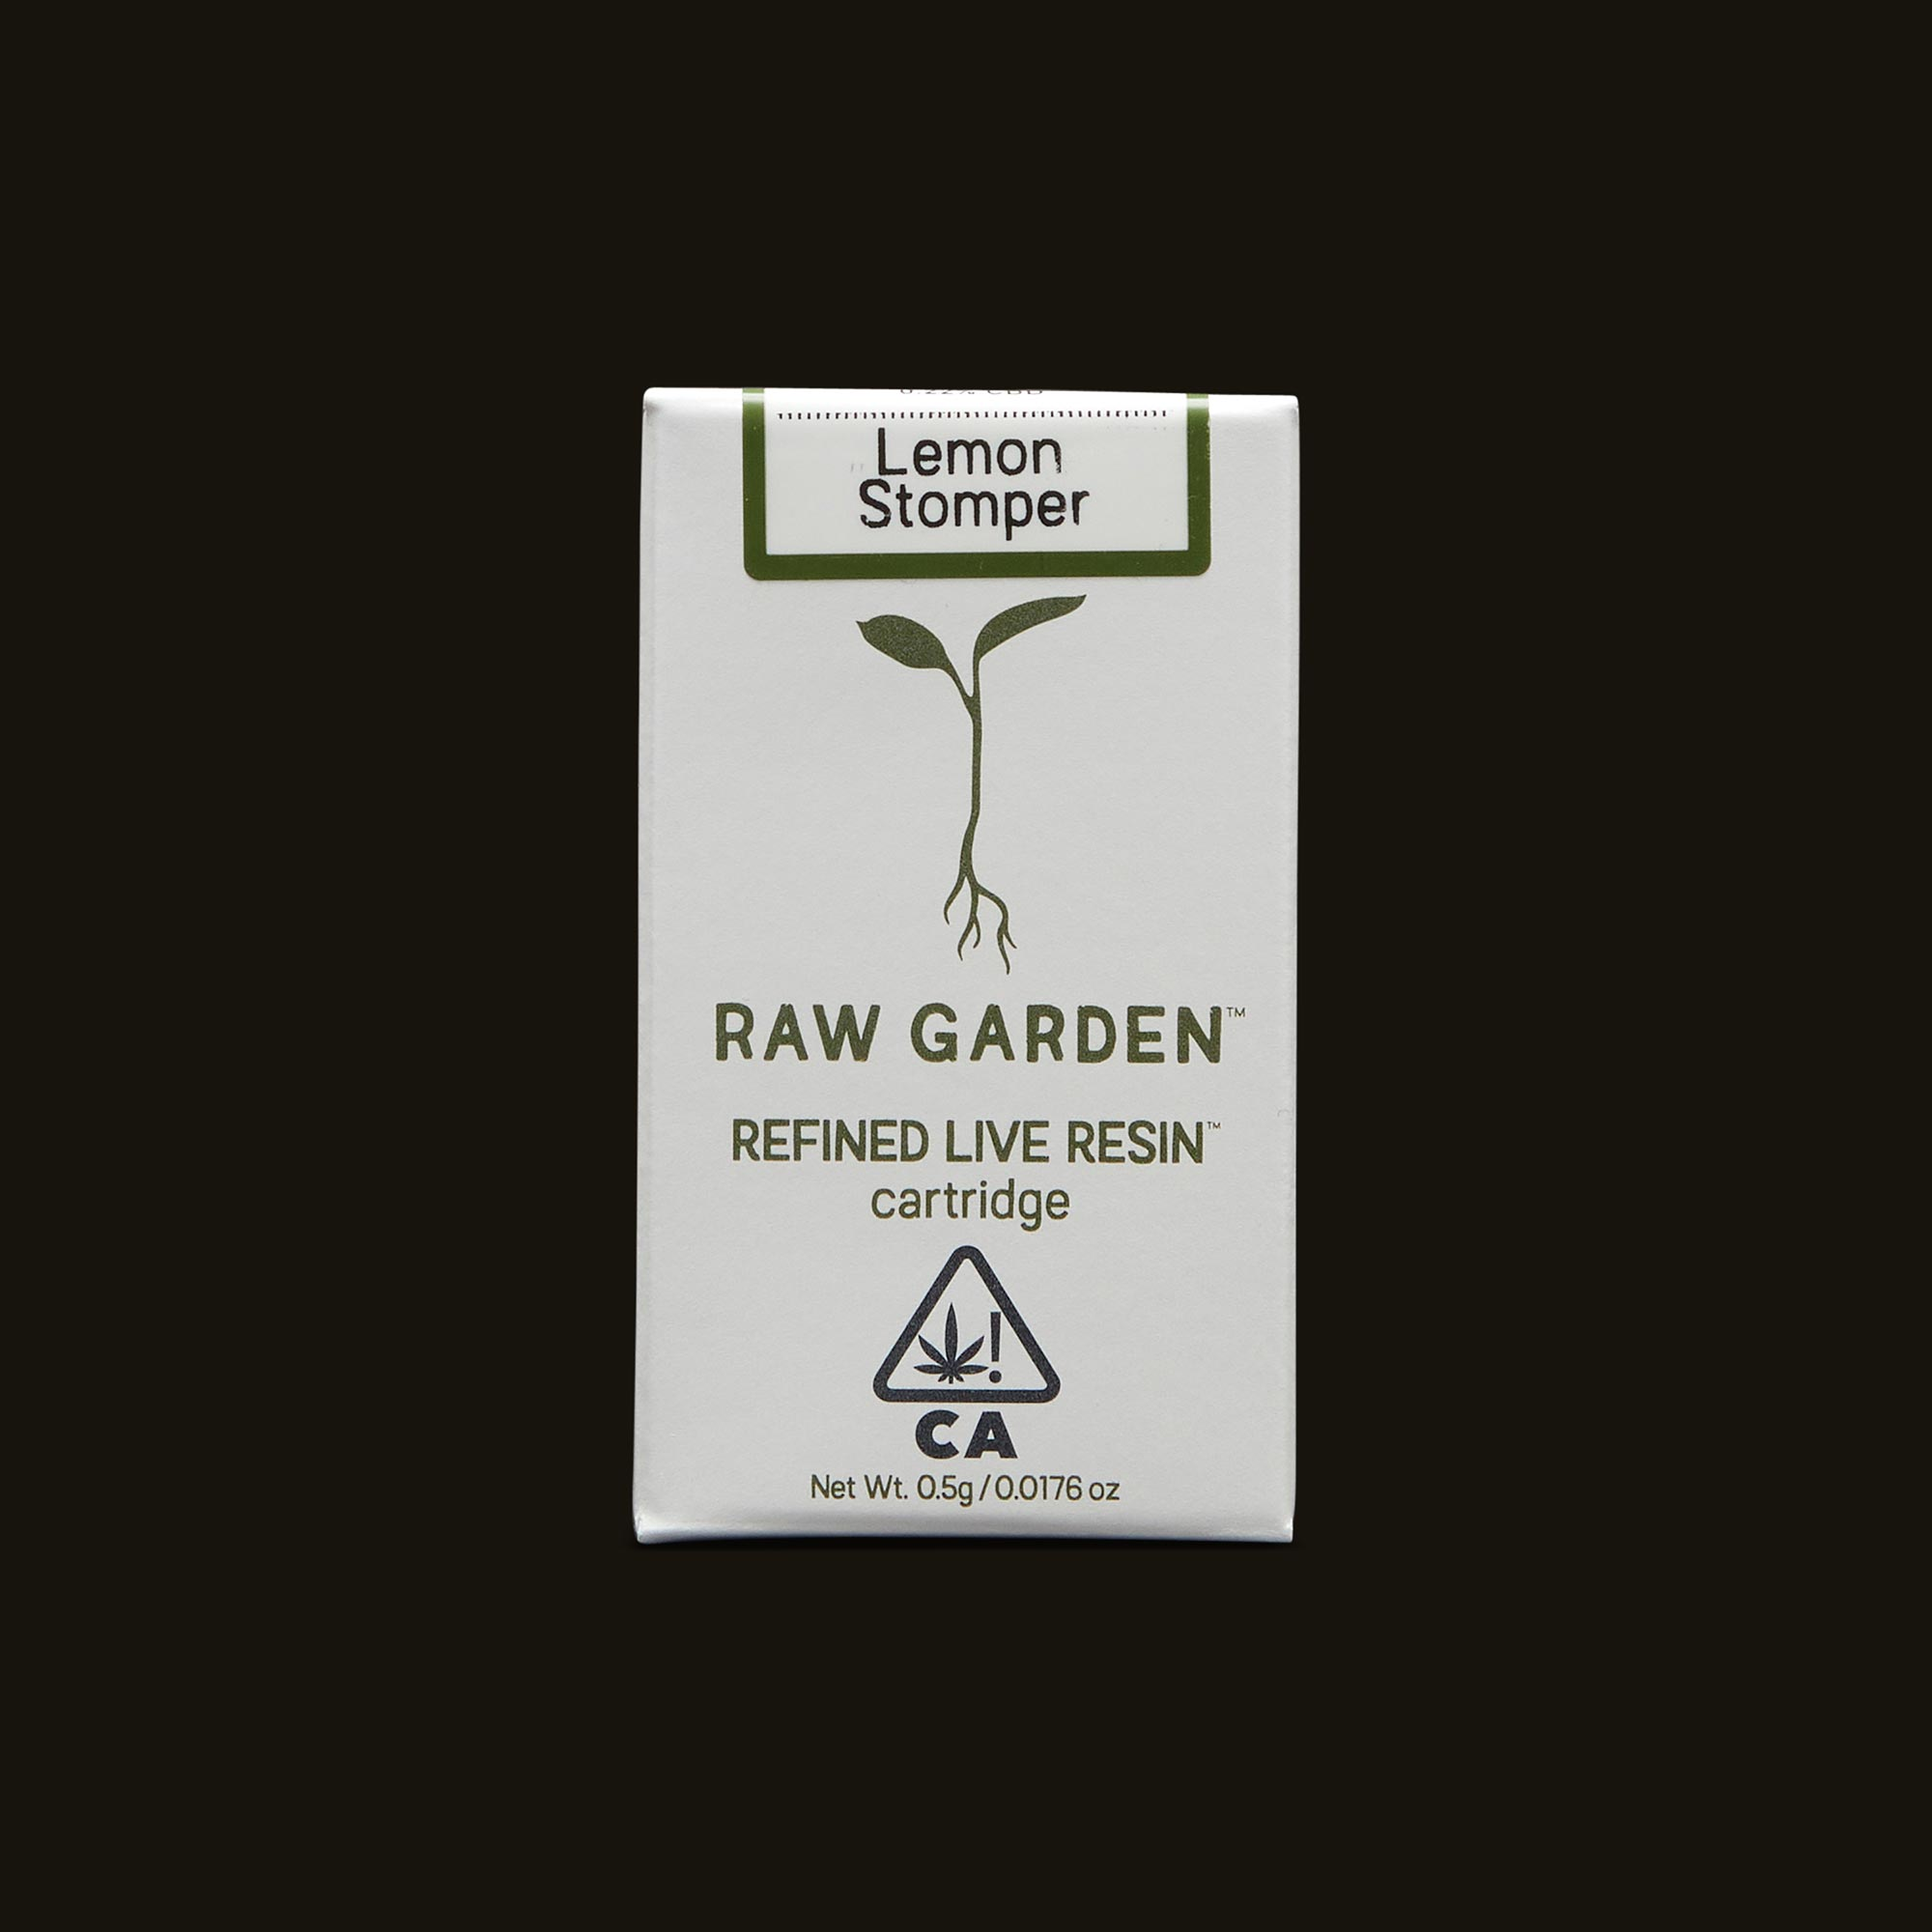 Lemon Stomper Cartridge - 500mg cartridge